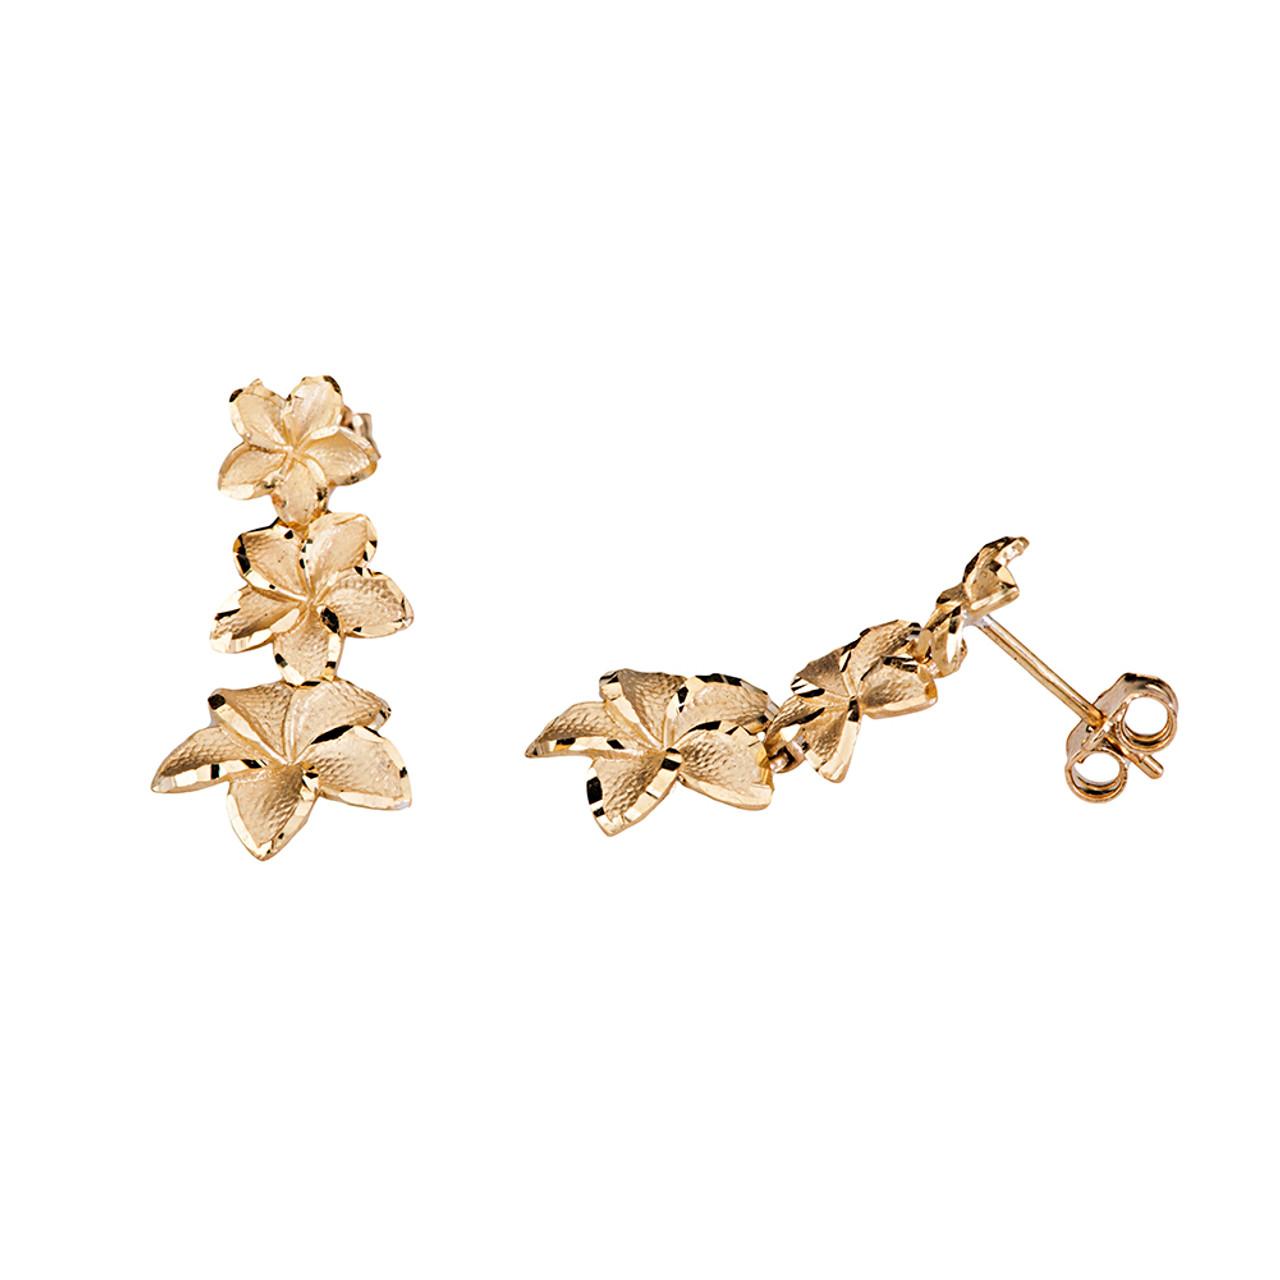 71b7c9e33cd1e Elegant Hawaiian Plumeria Flower Earrings in Yellow Gold